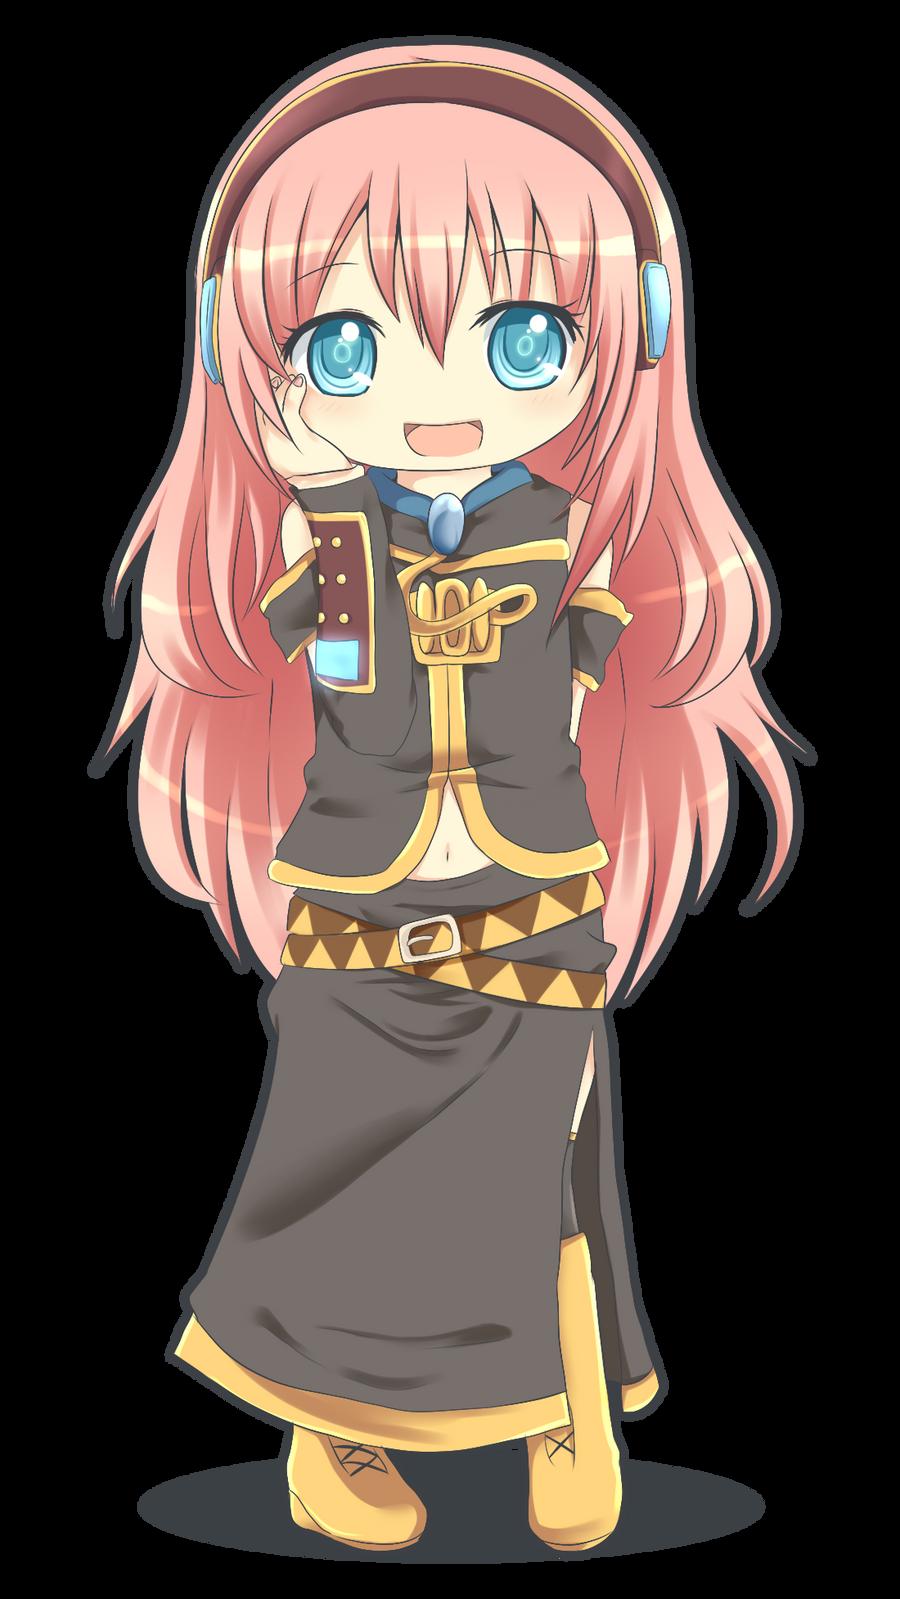 Megurine Luka | Vocaloid Wiki | FANDOM powered by Wikia